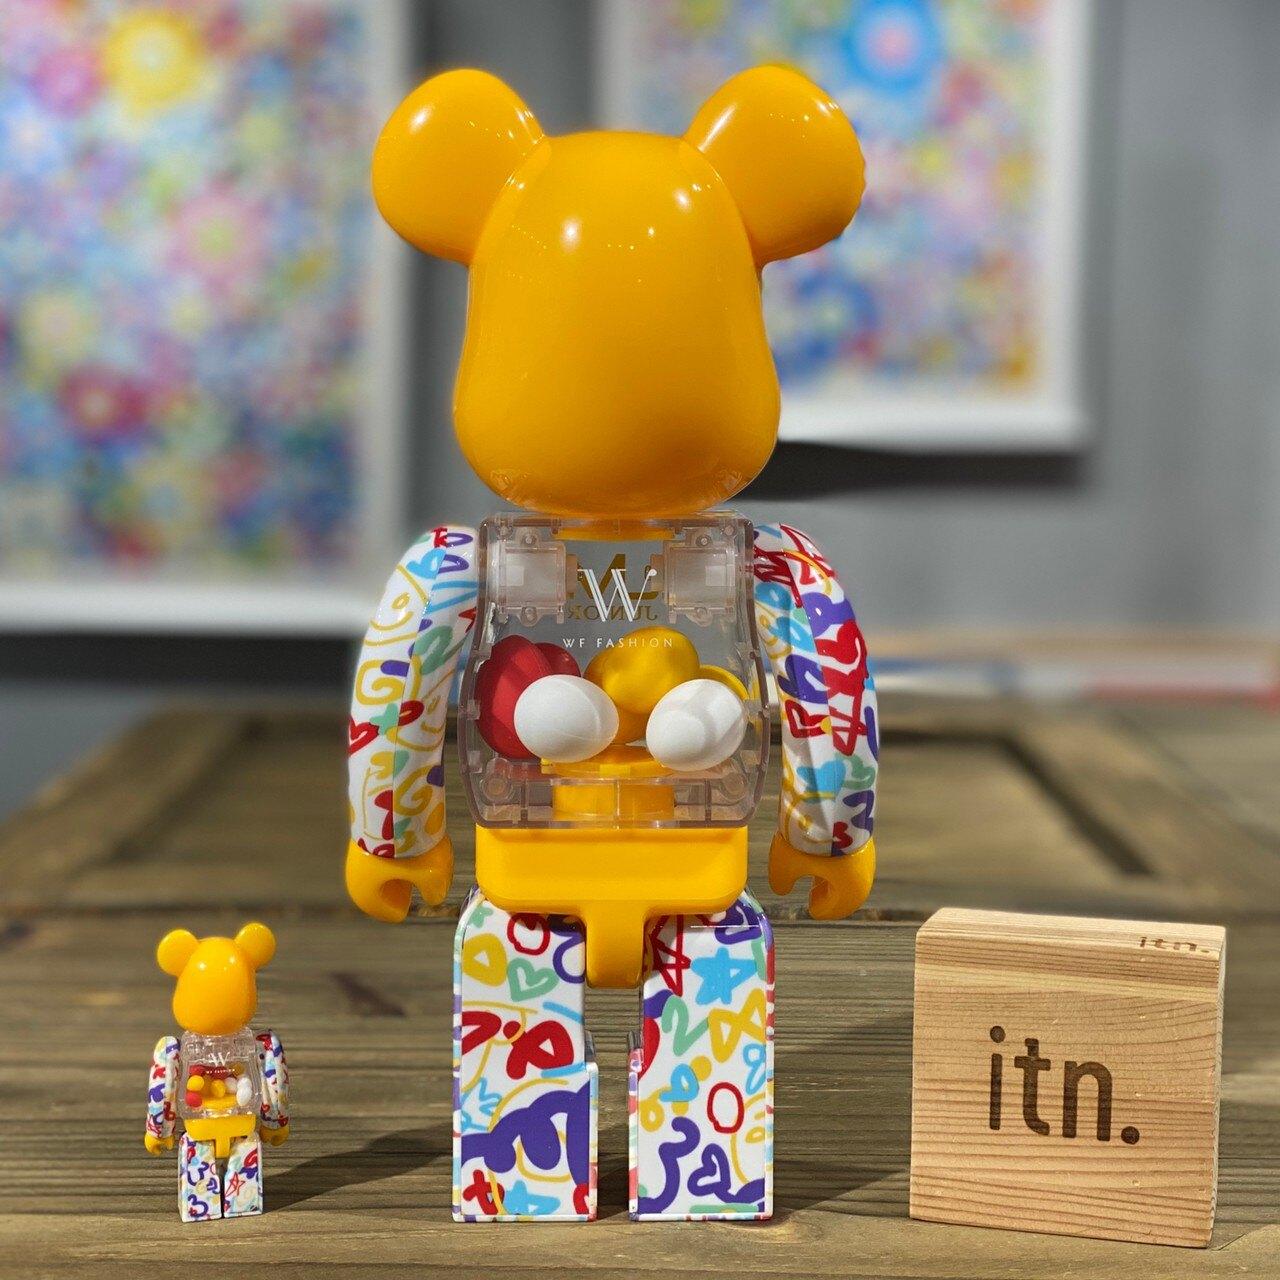 BE@RBRICK UM Junior 彩蛋 2020 MACAU 澳門 限定  400% + 100%